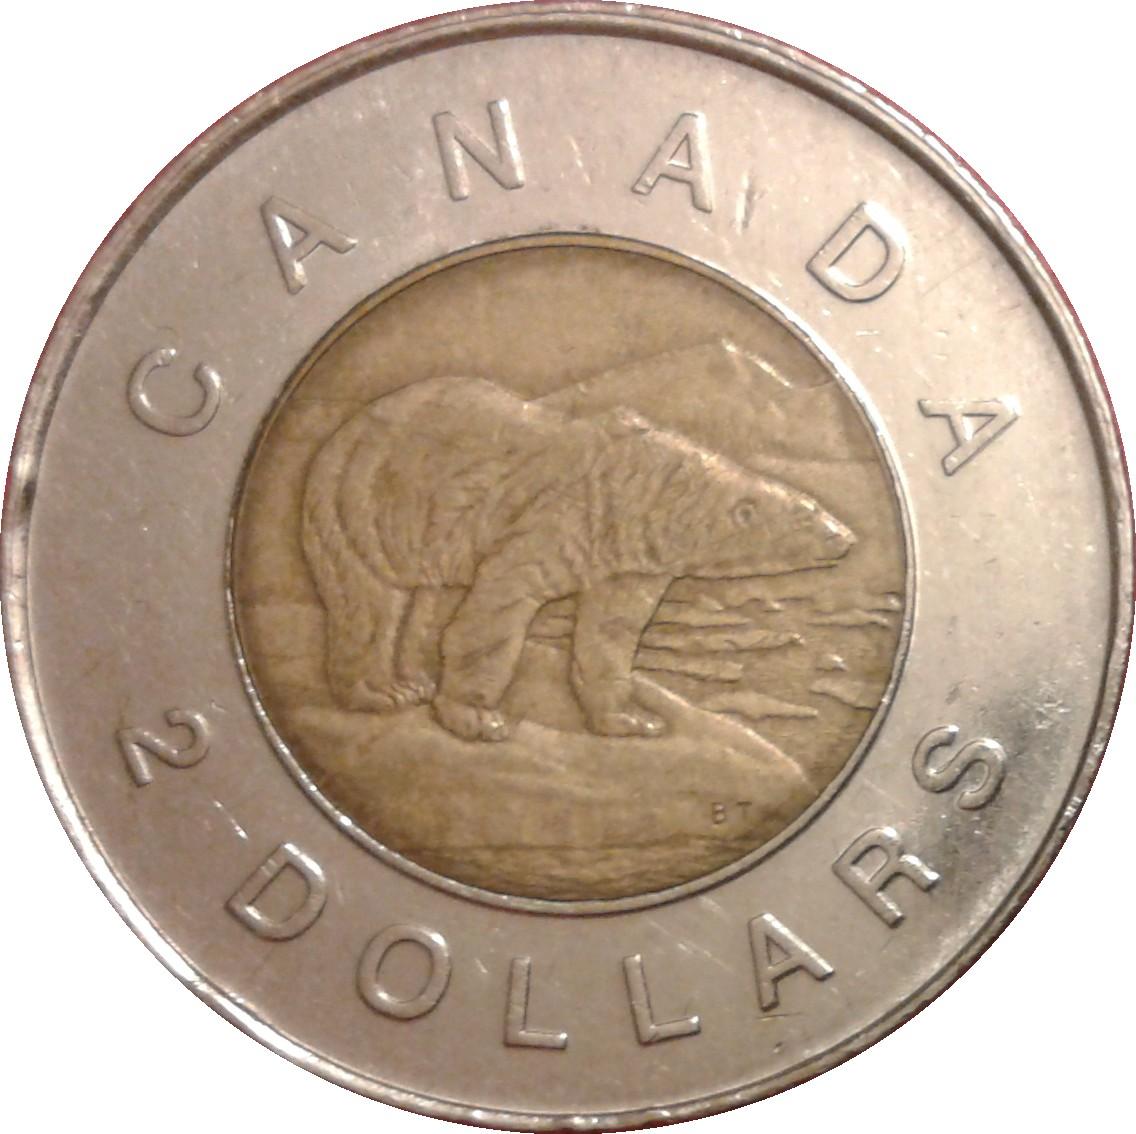 2 canadian